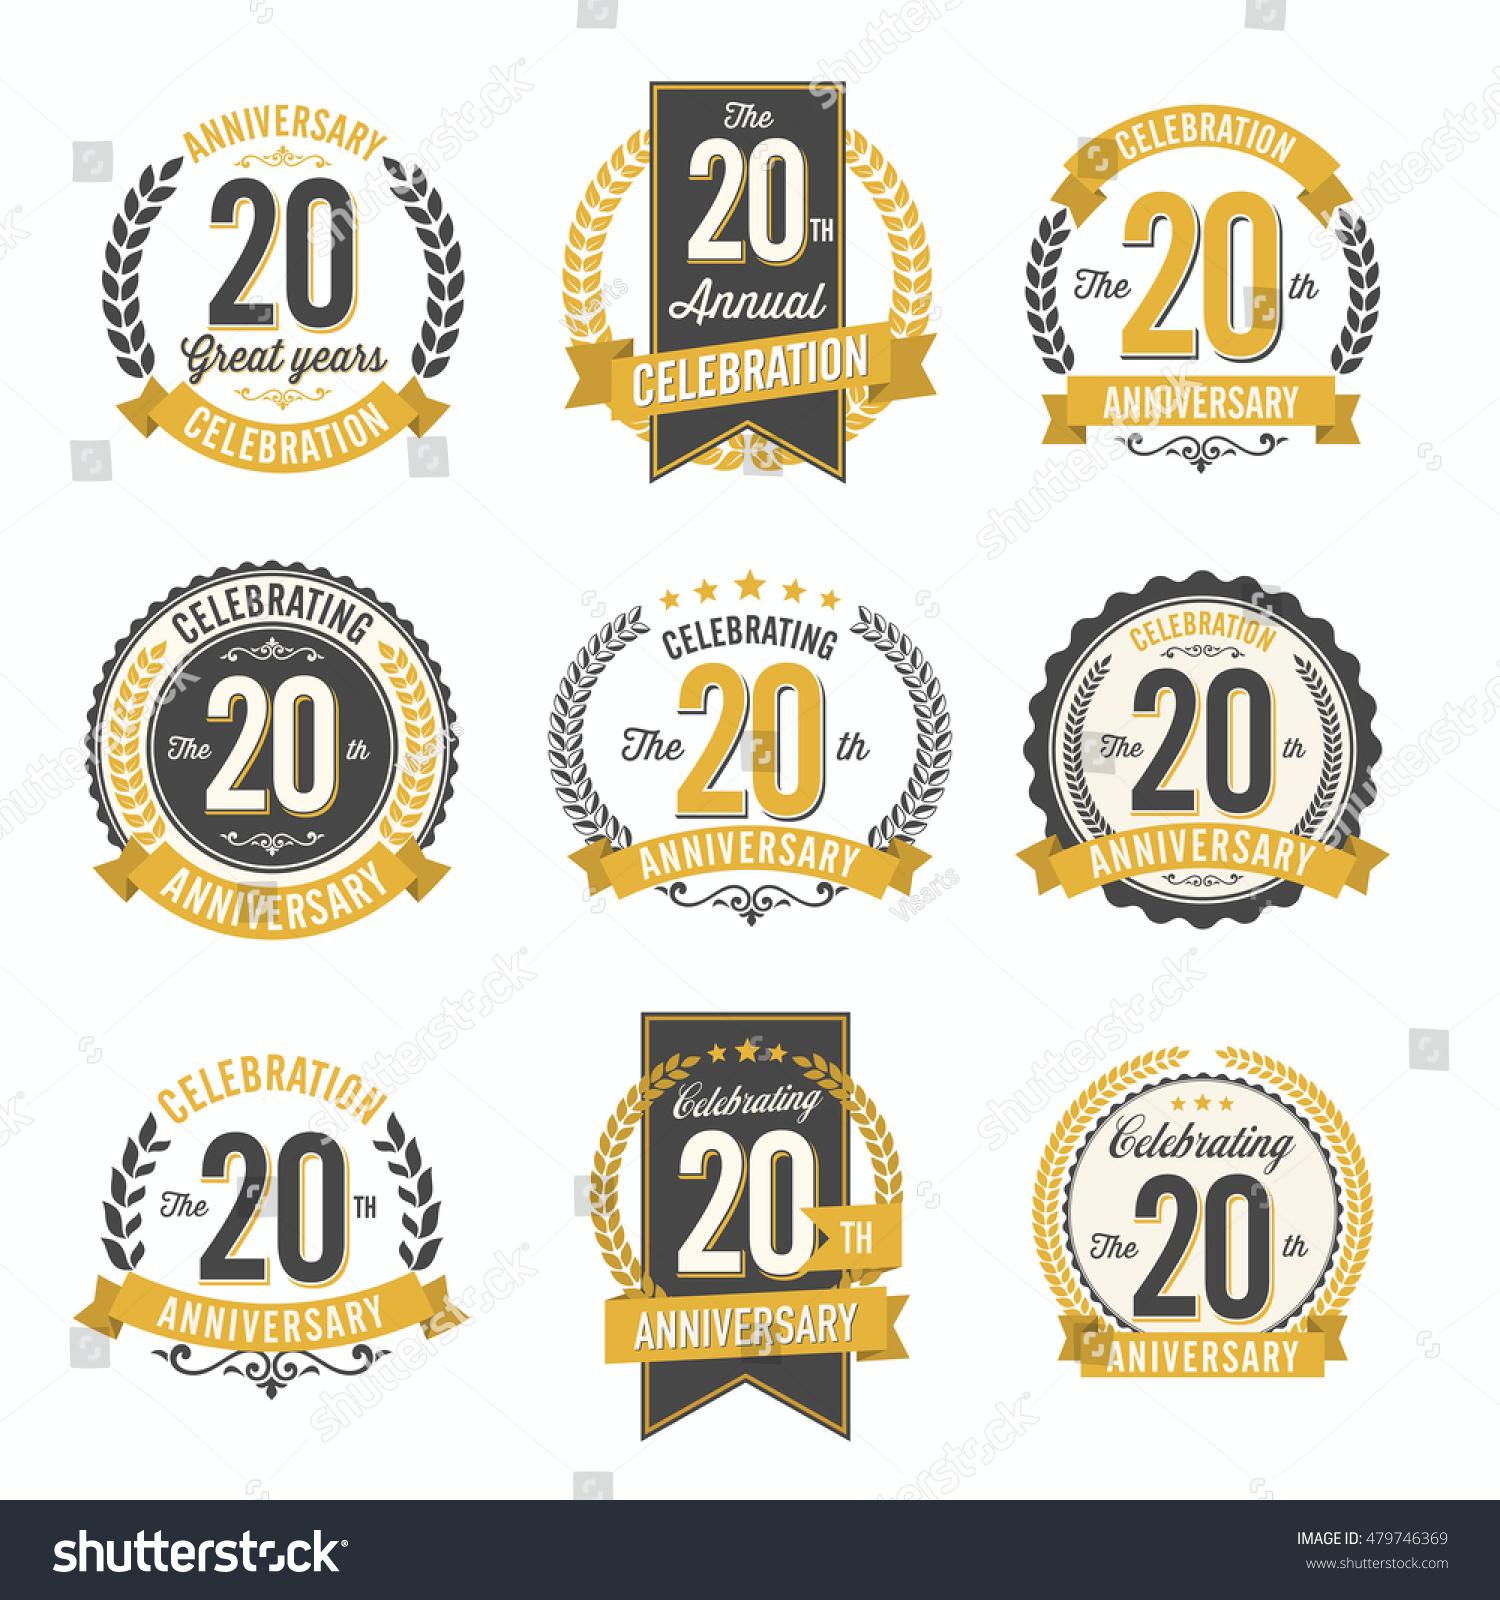 Set vintage anniversary badges 20th years stock vector 479746369 set of vintage anniversary badges 20th years celebration biocorpaavc Choice Image